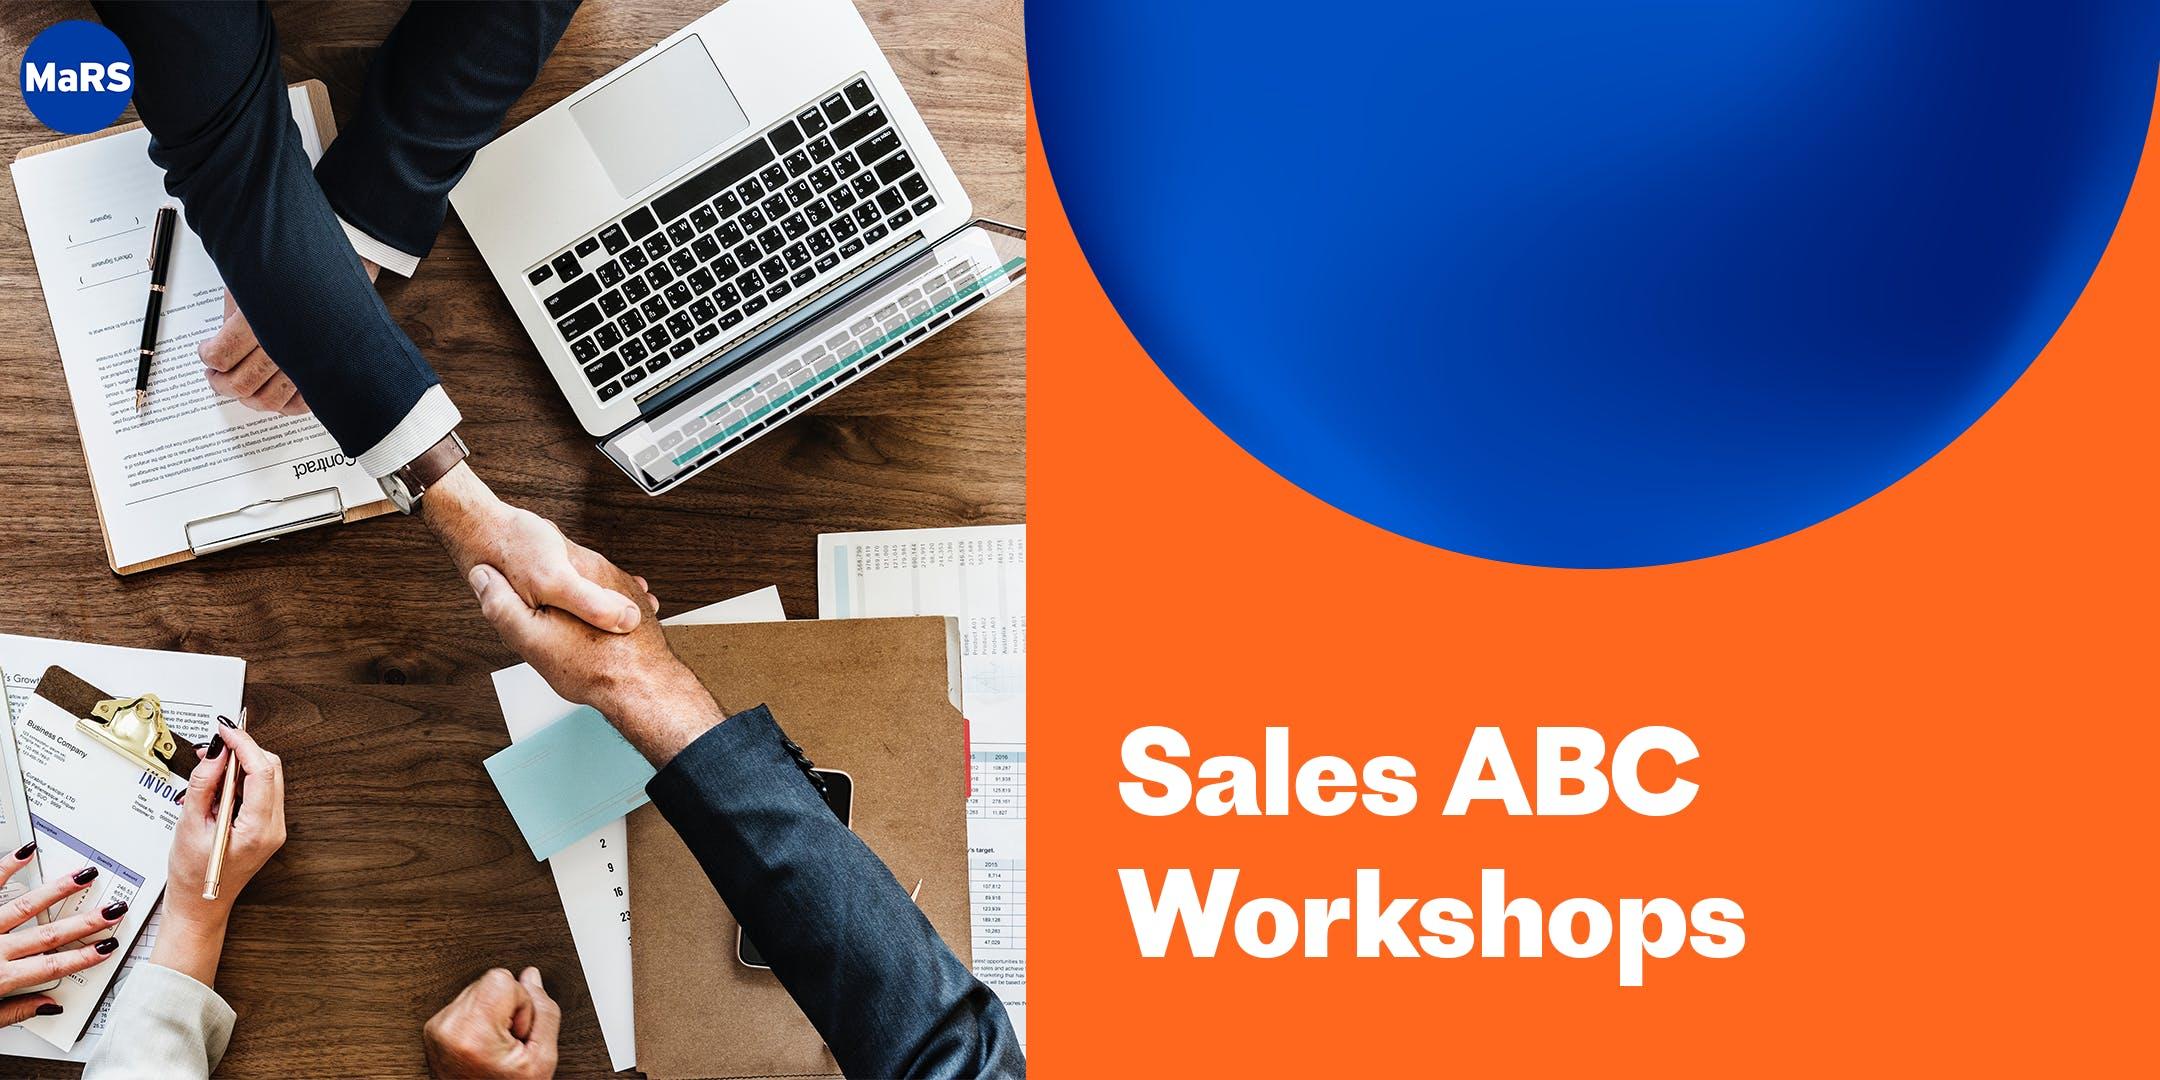 MaRS Sales ABC Workshops  September 10 19 26 (Sep-2019)